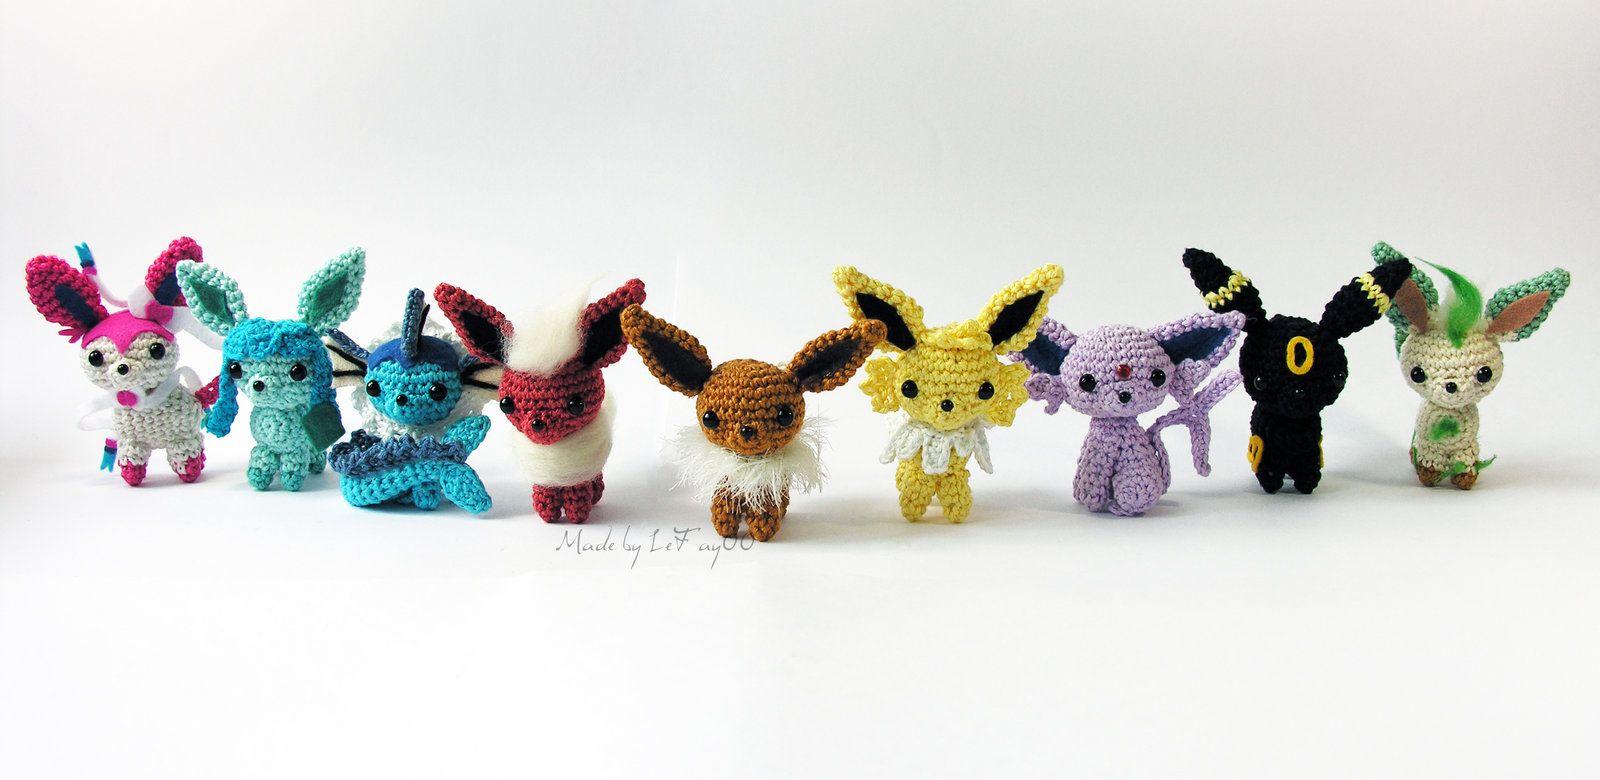 These Stuffed Pokémon Dolls Are Way Too Freakin Cute | Nerdy stuff ...